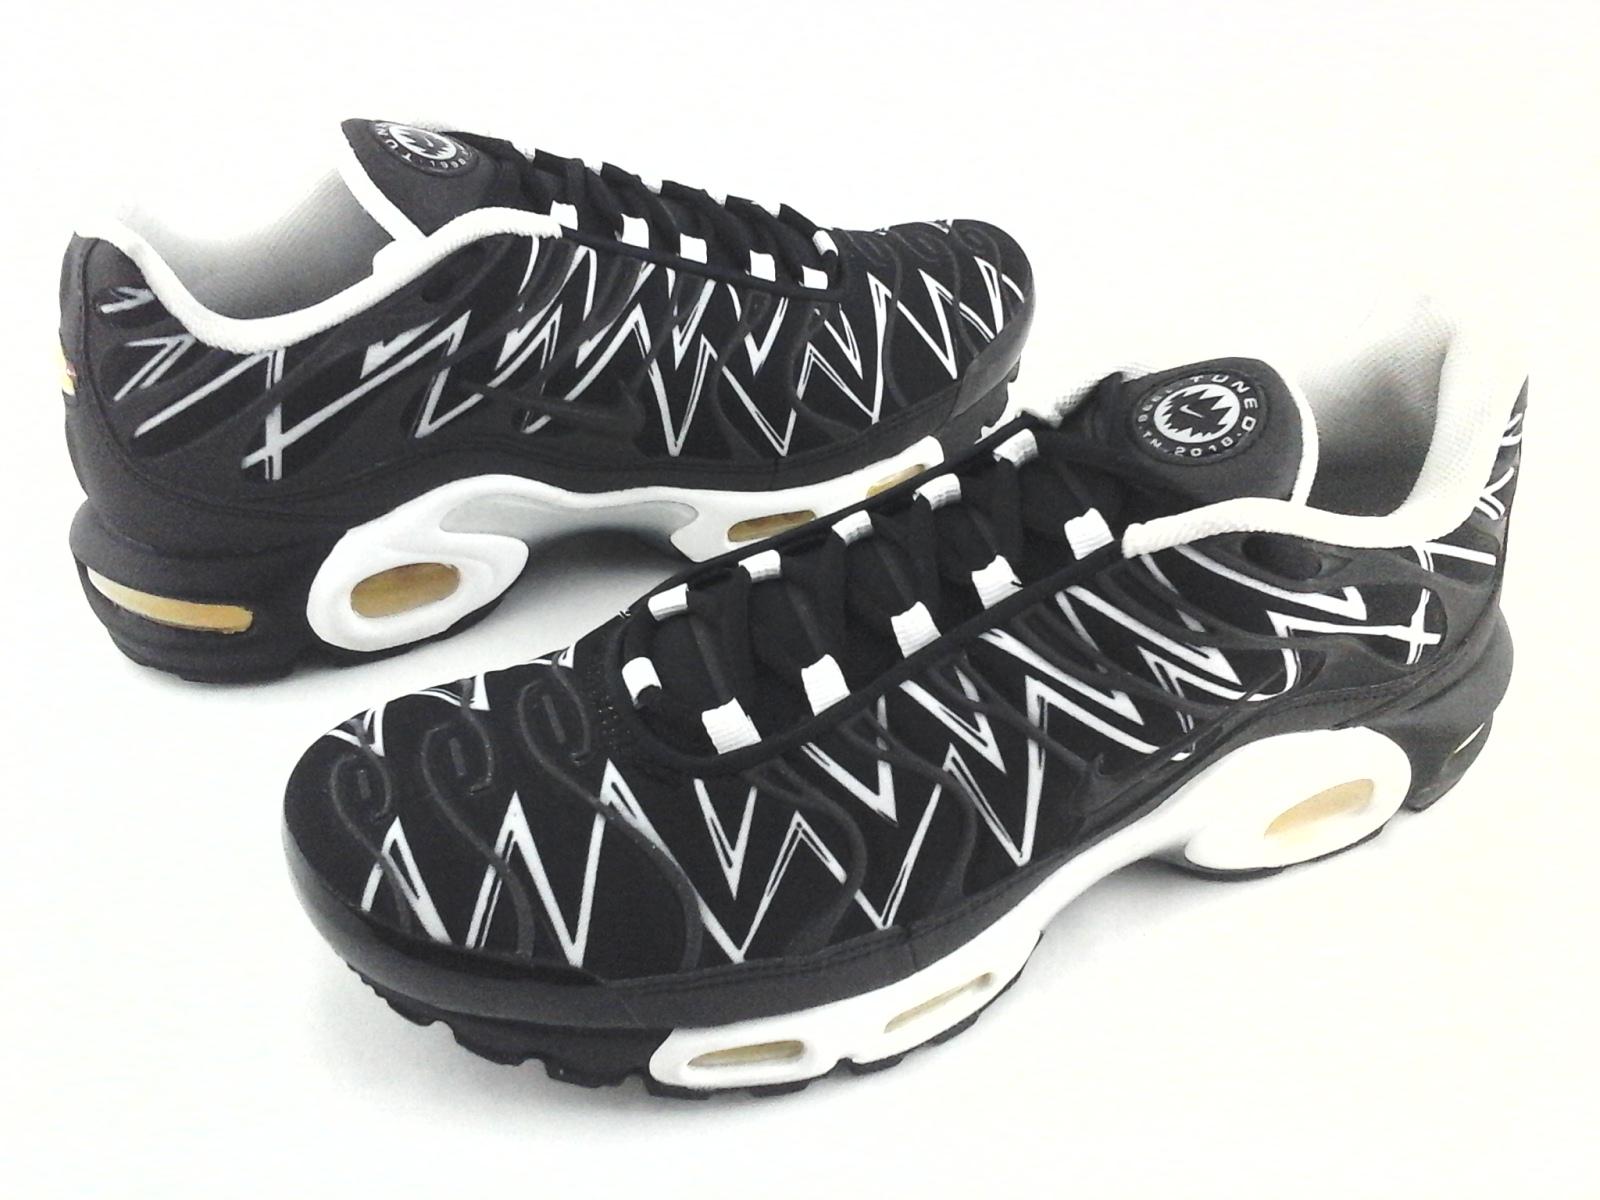 super popular bdd23 01f85 Details about NIKE AIR Max Plus Tuned TN The Shark Teeth AJ6311-001  Sneakers Mens US 10 EU 44